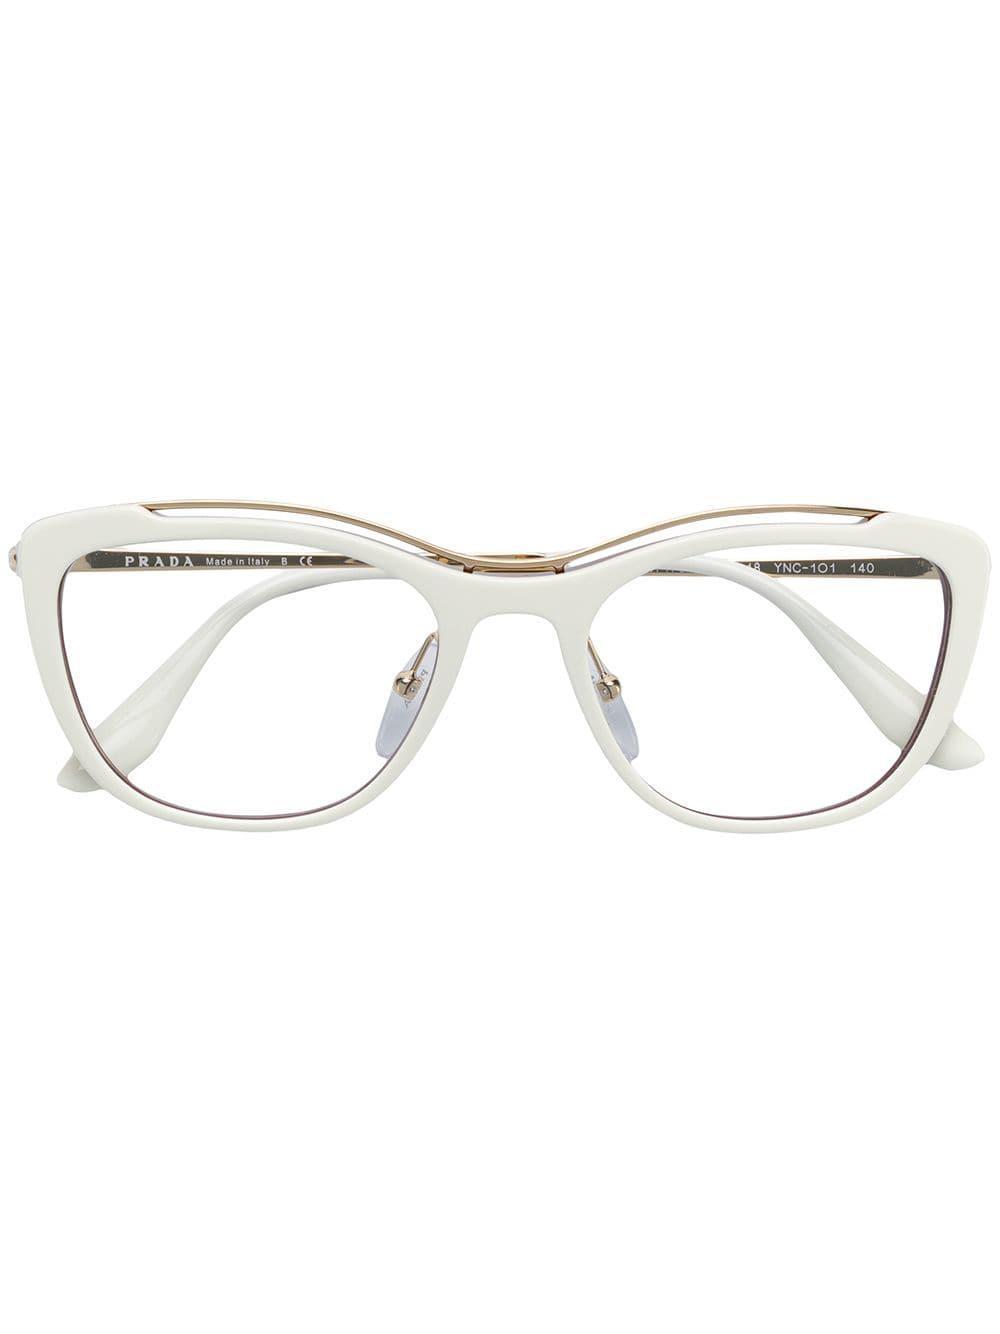 177ba002a4f Prada Square Shaped Glasses in White - Lyst